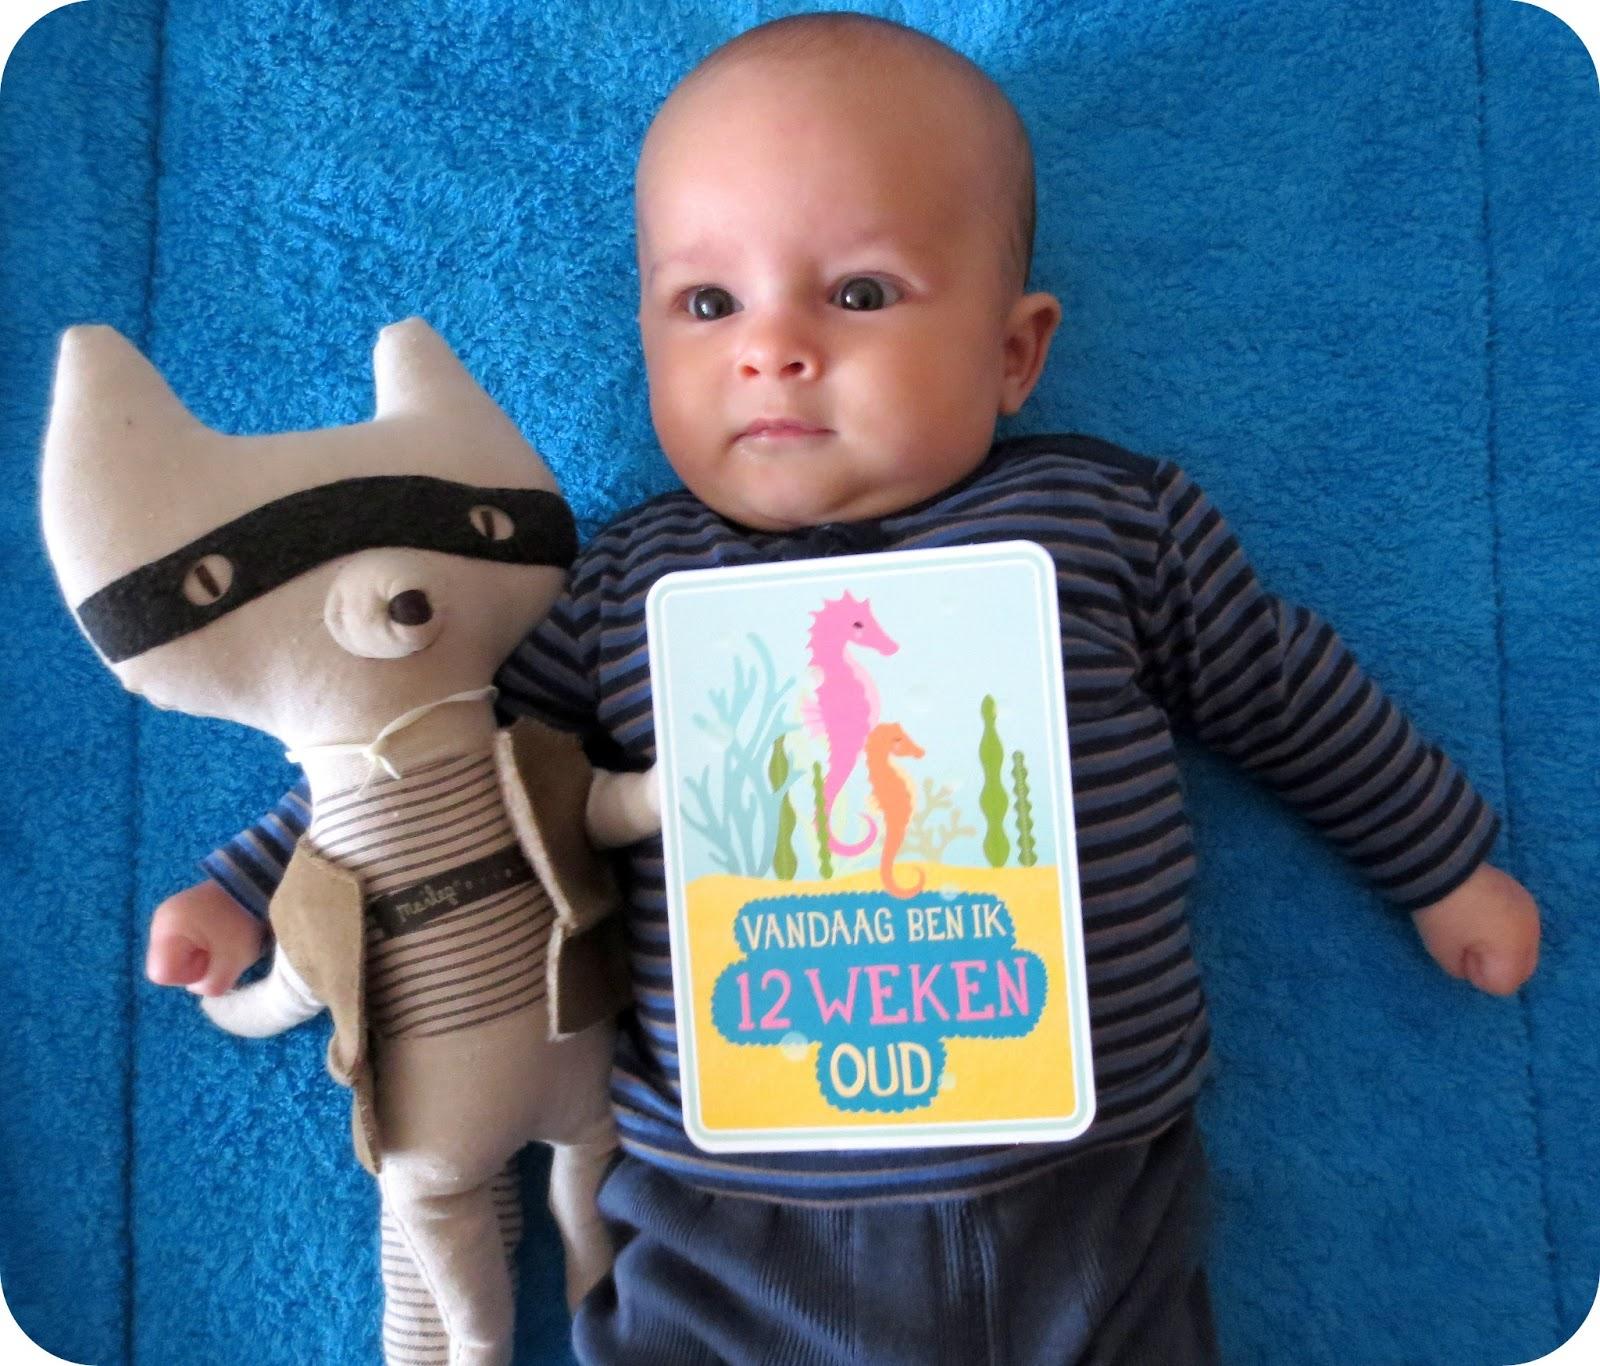 Baby Rug Naar Buik Draaien: Tiene: Milestone Baby Card : 12 Weken